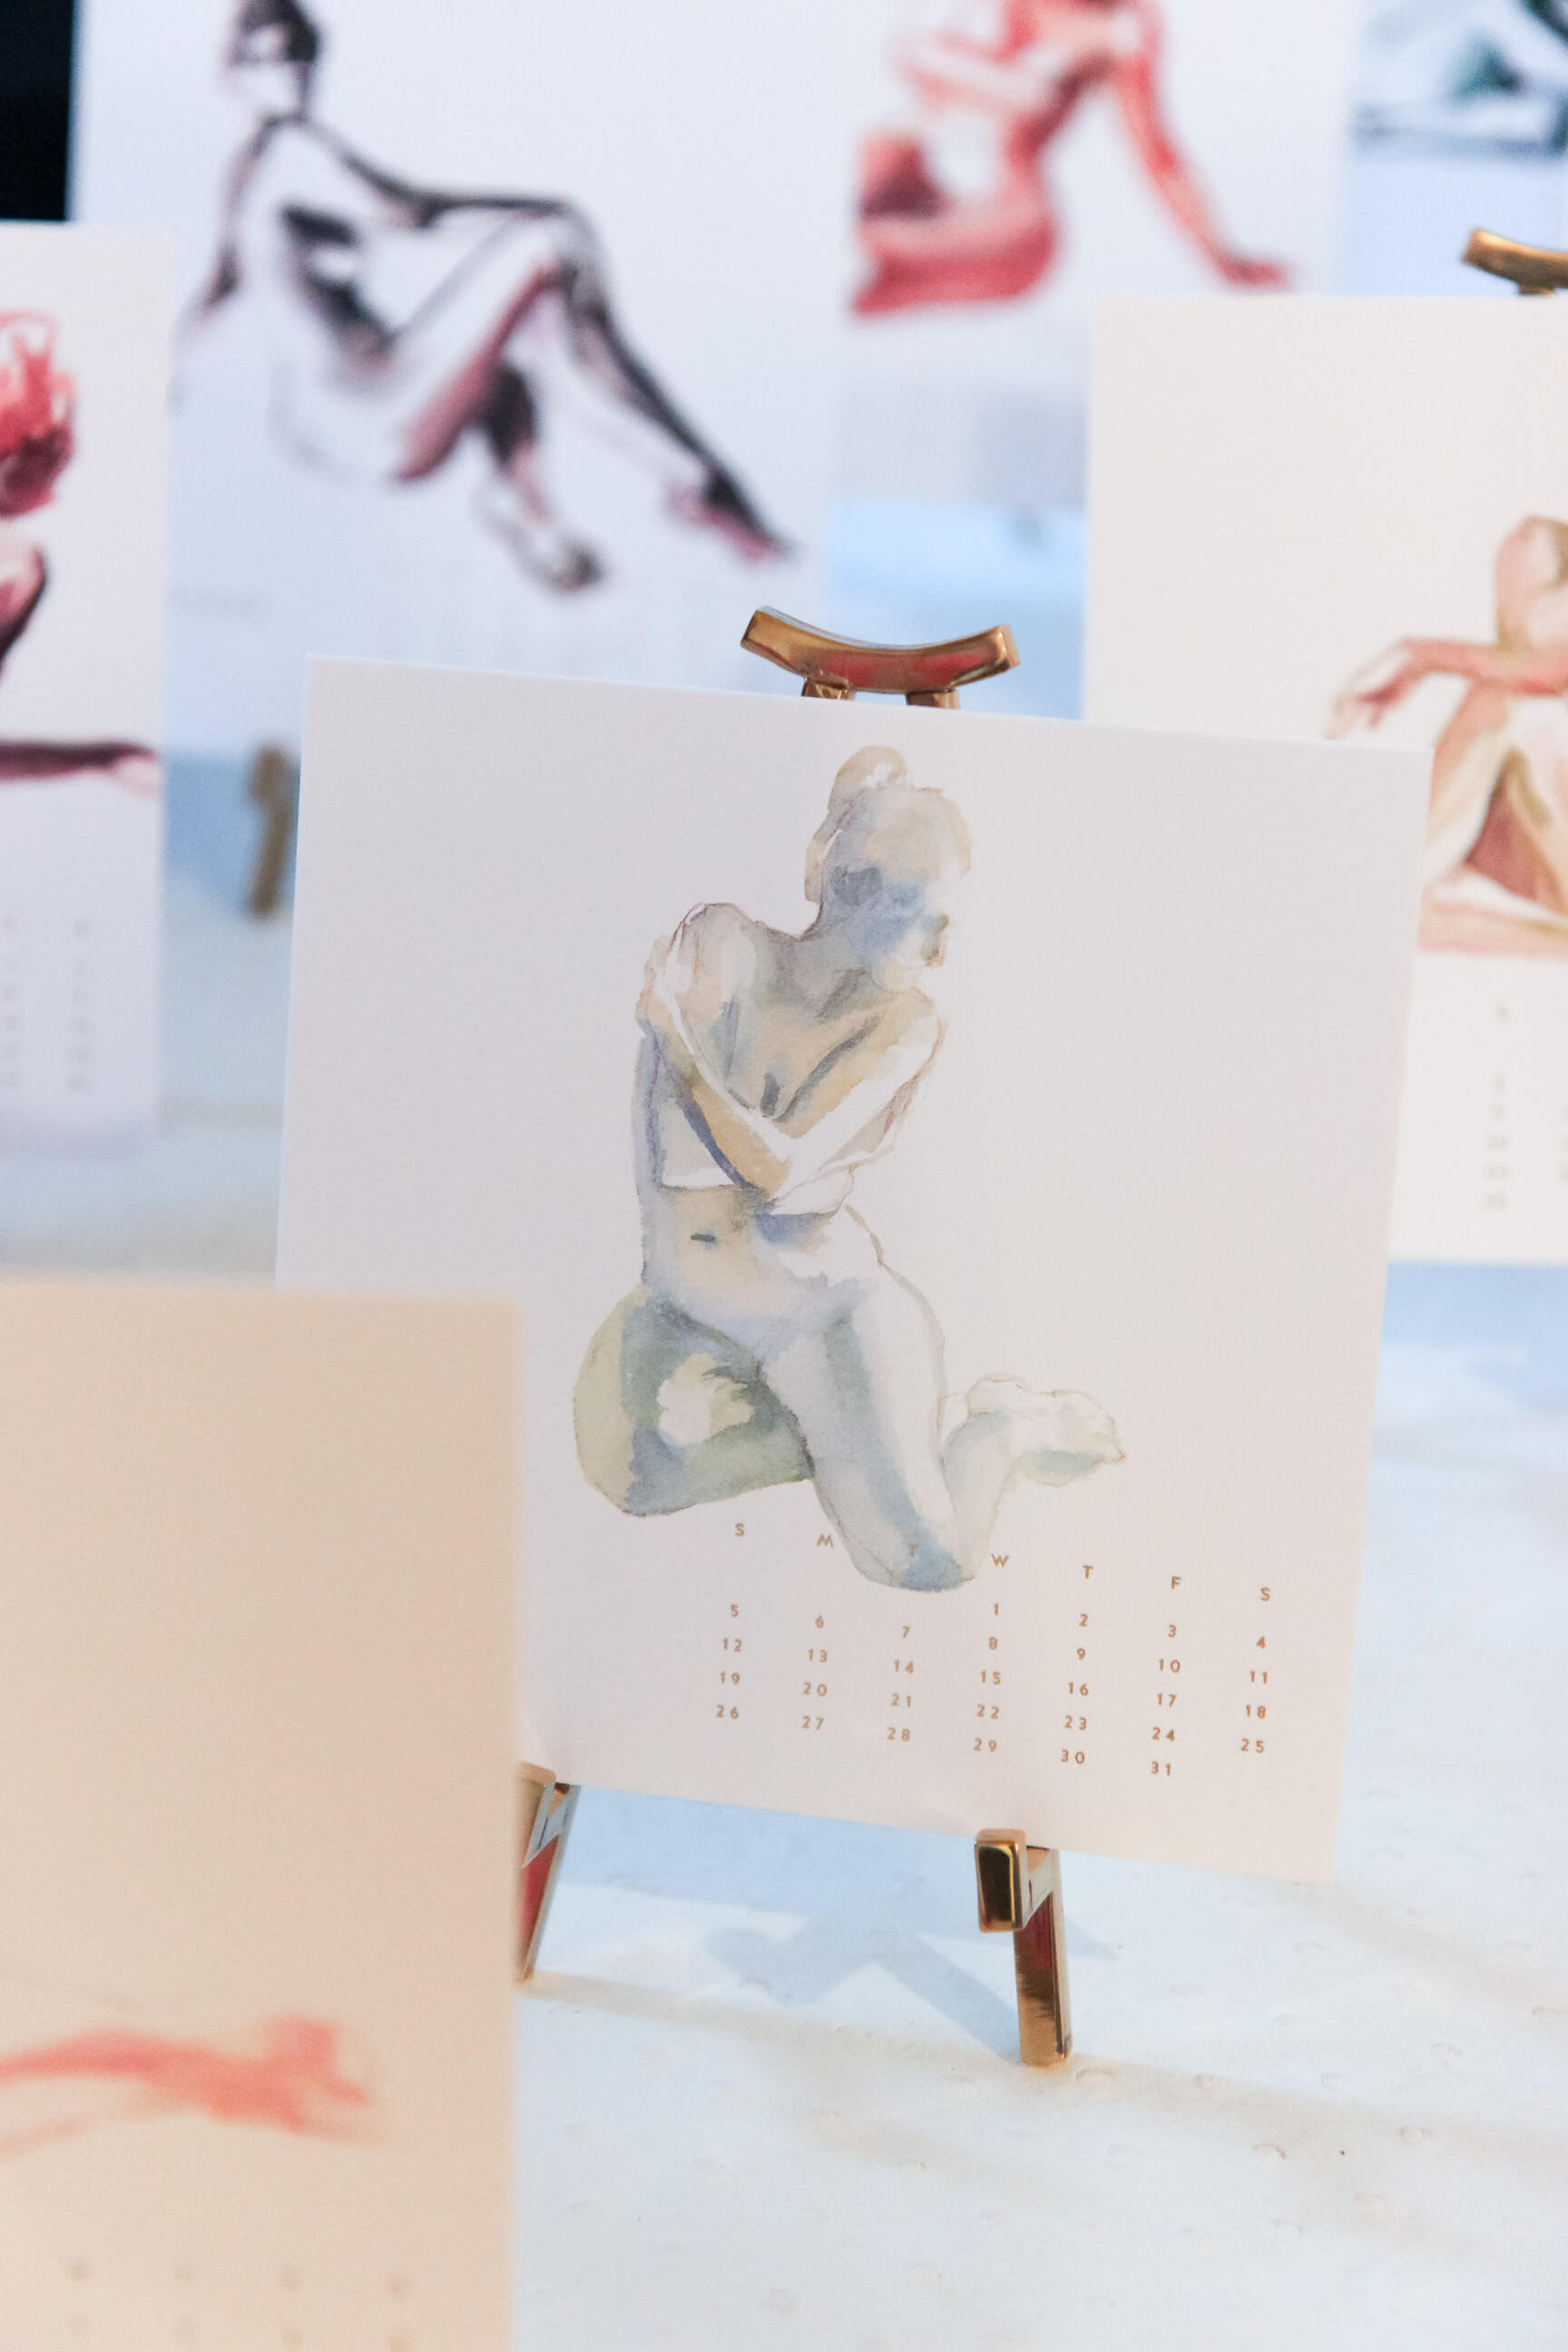 Inslee nudes desk calendar